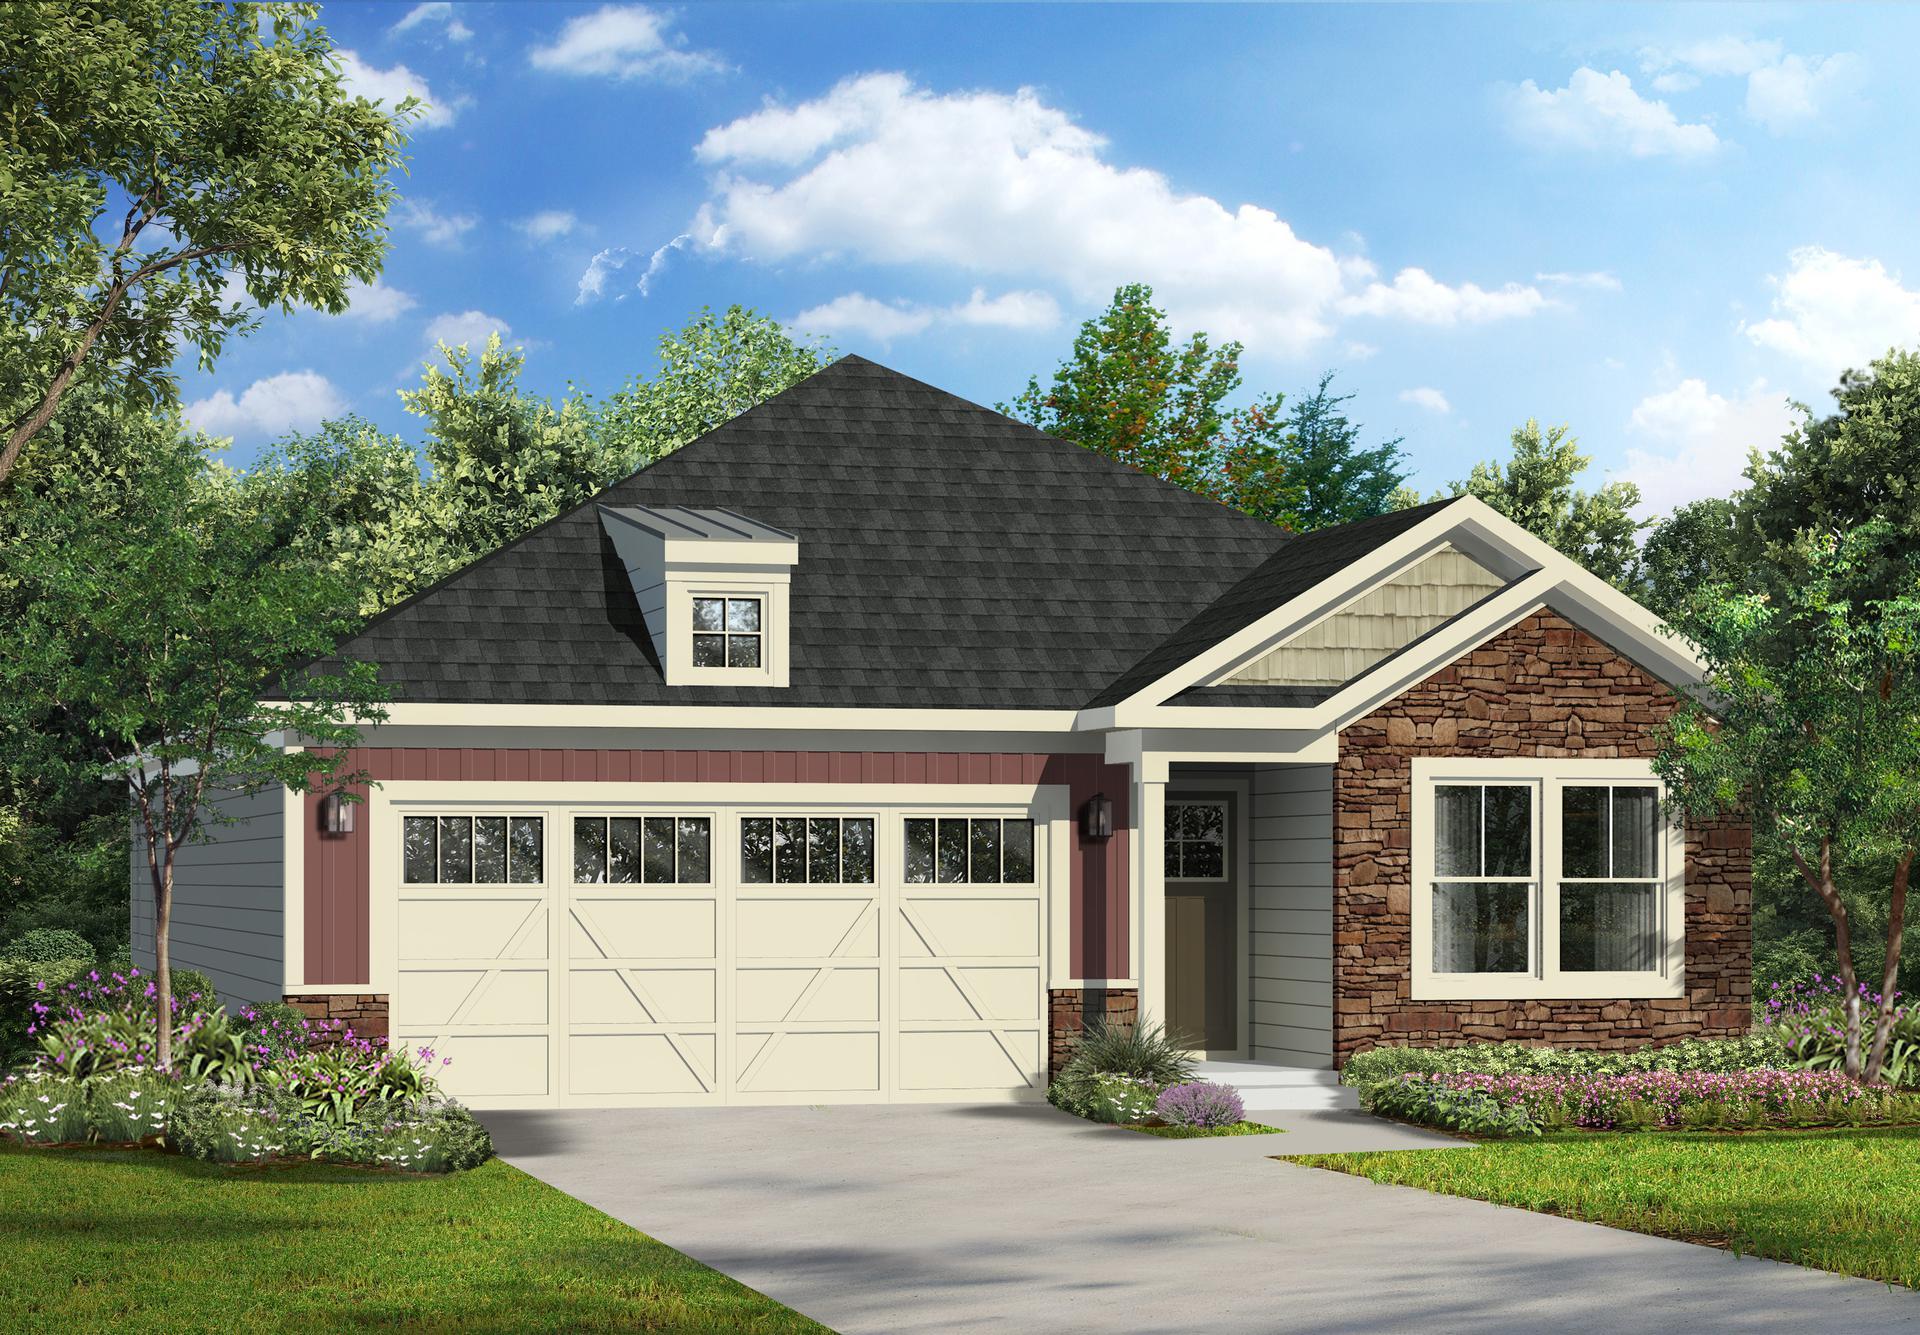 Osmond New Home in Pennsylvania